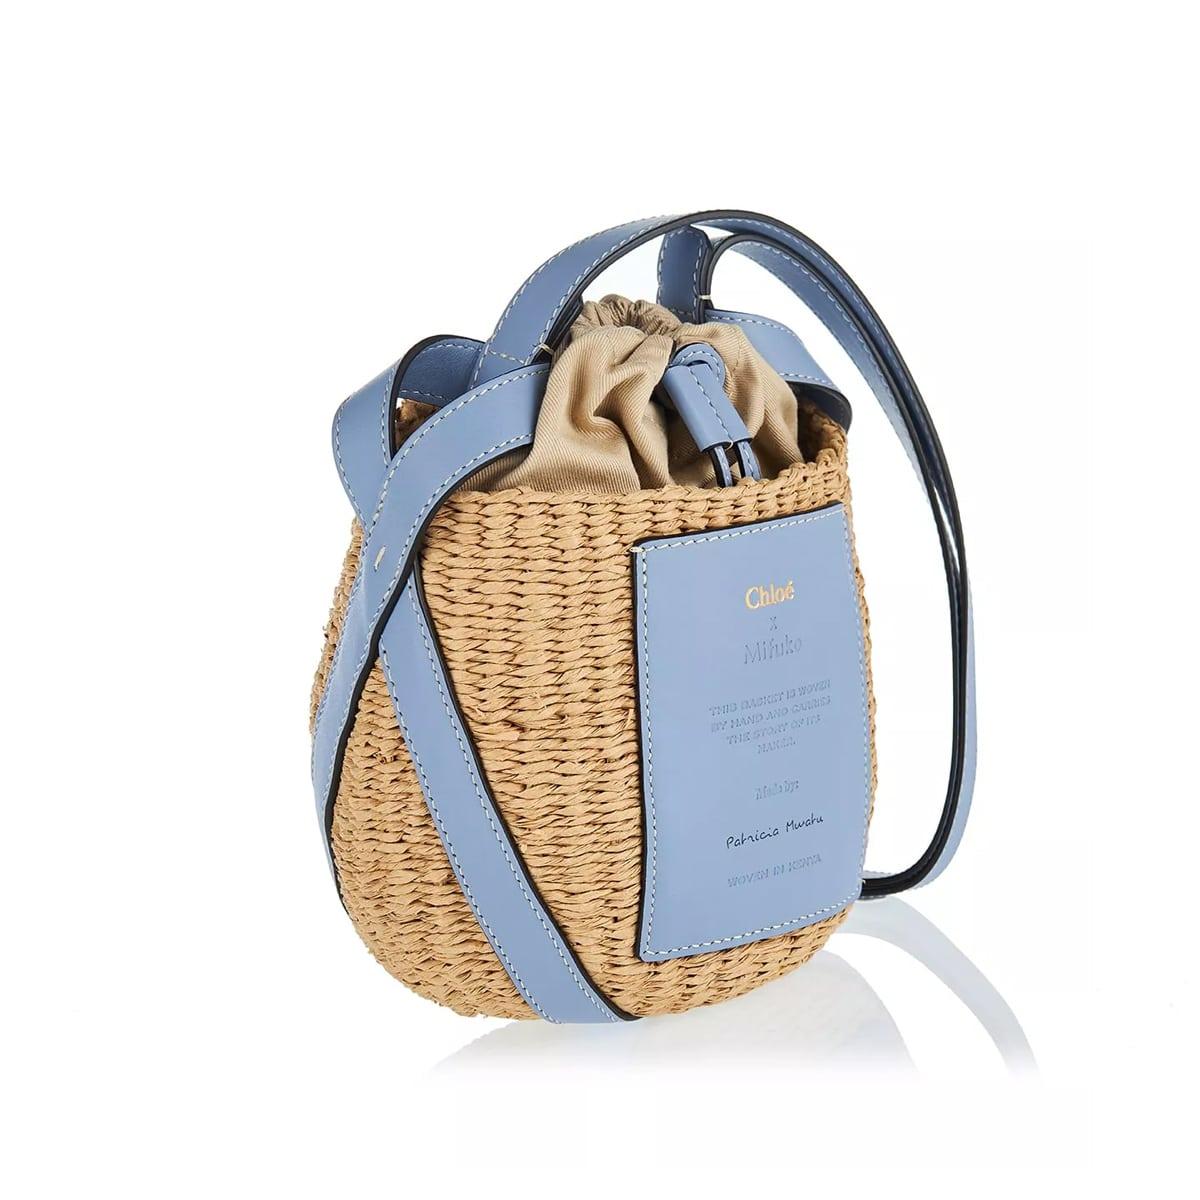 Small fair-trade paper basket bag